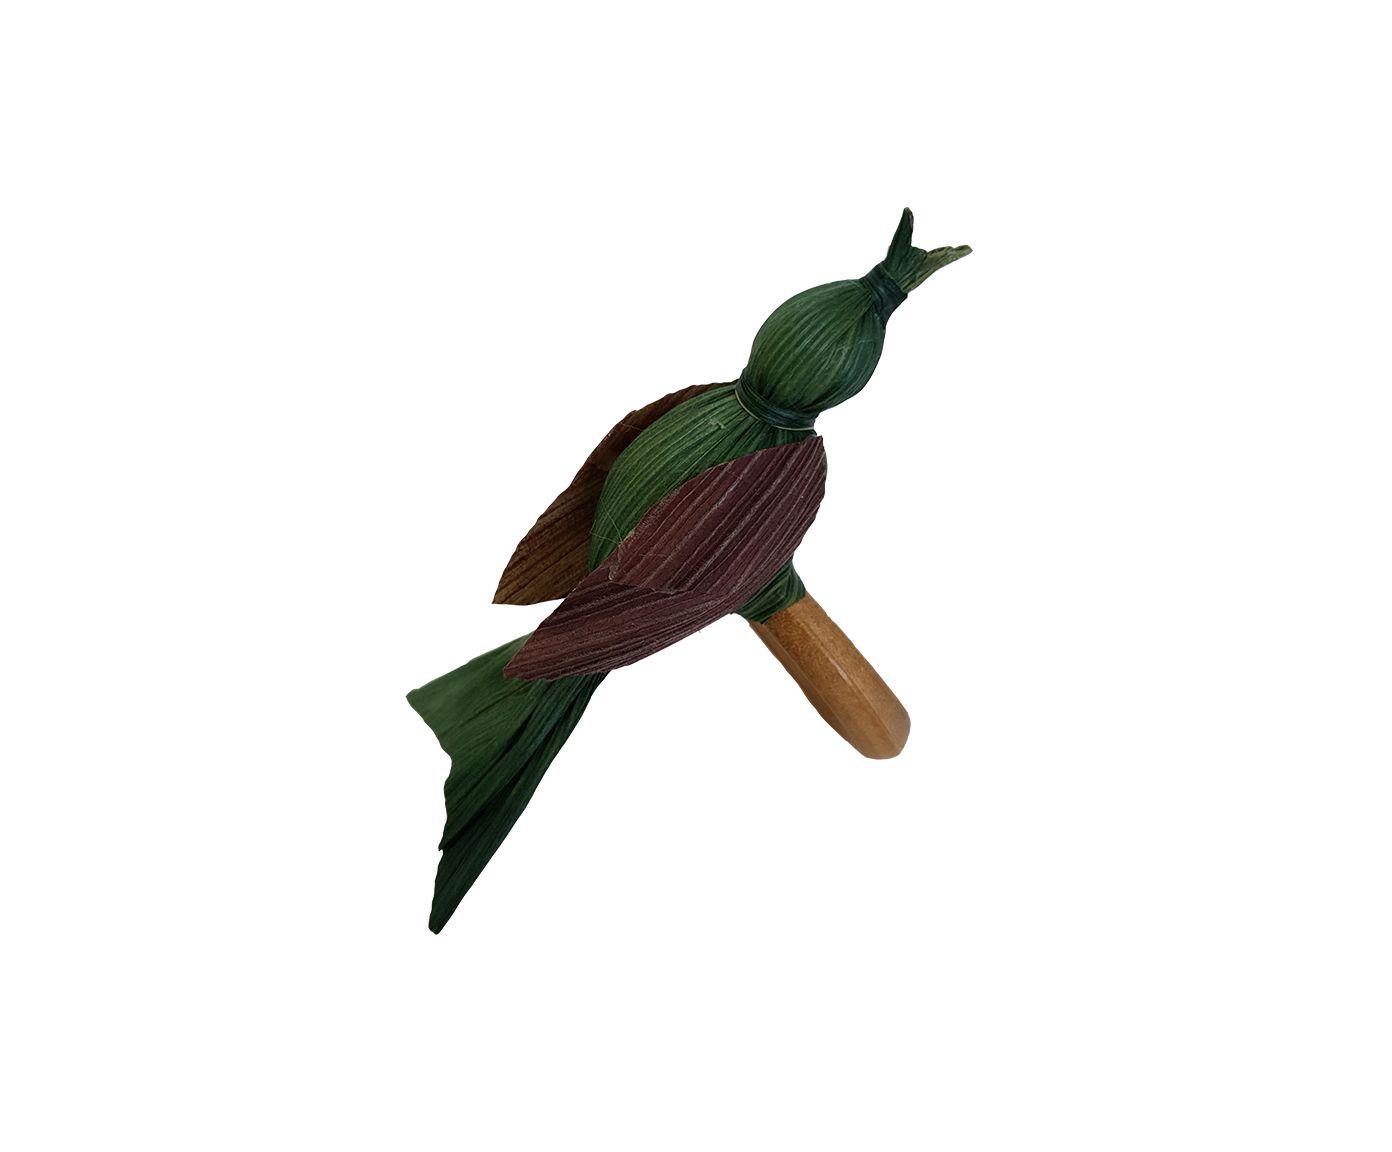 Anel para Guardanapo Pássaro Palha Verde - 6cm | Westwing.com.br